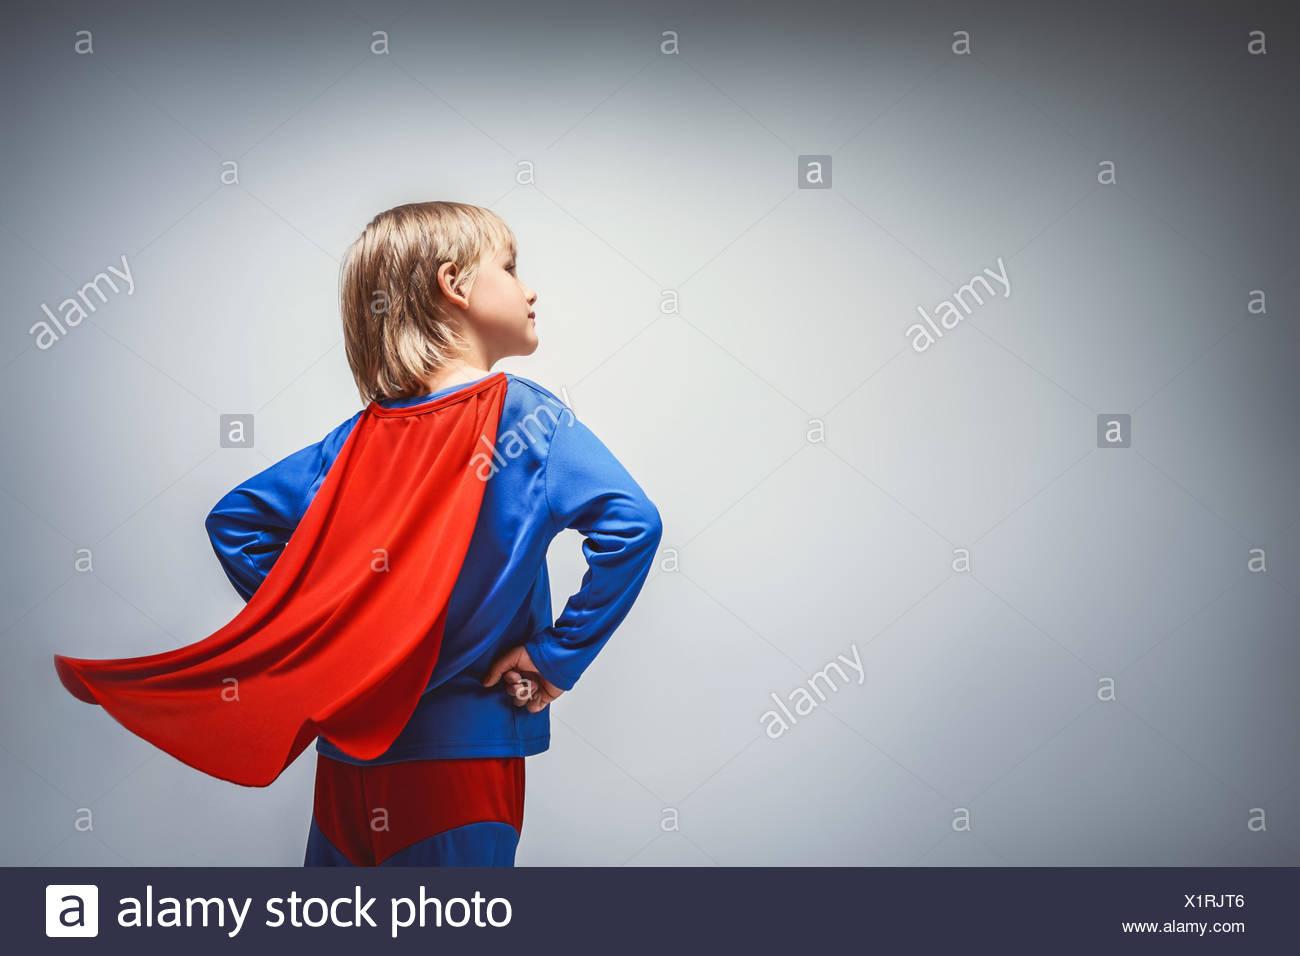 Boy - Stock Image